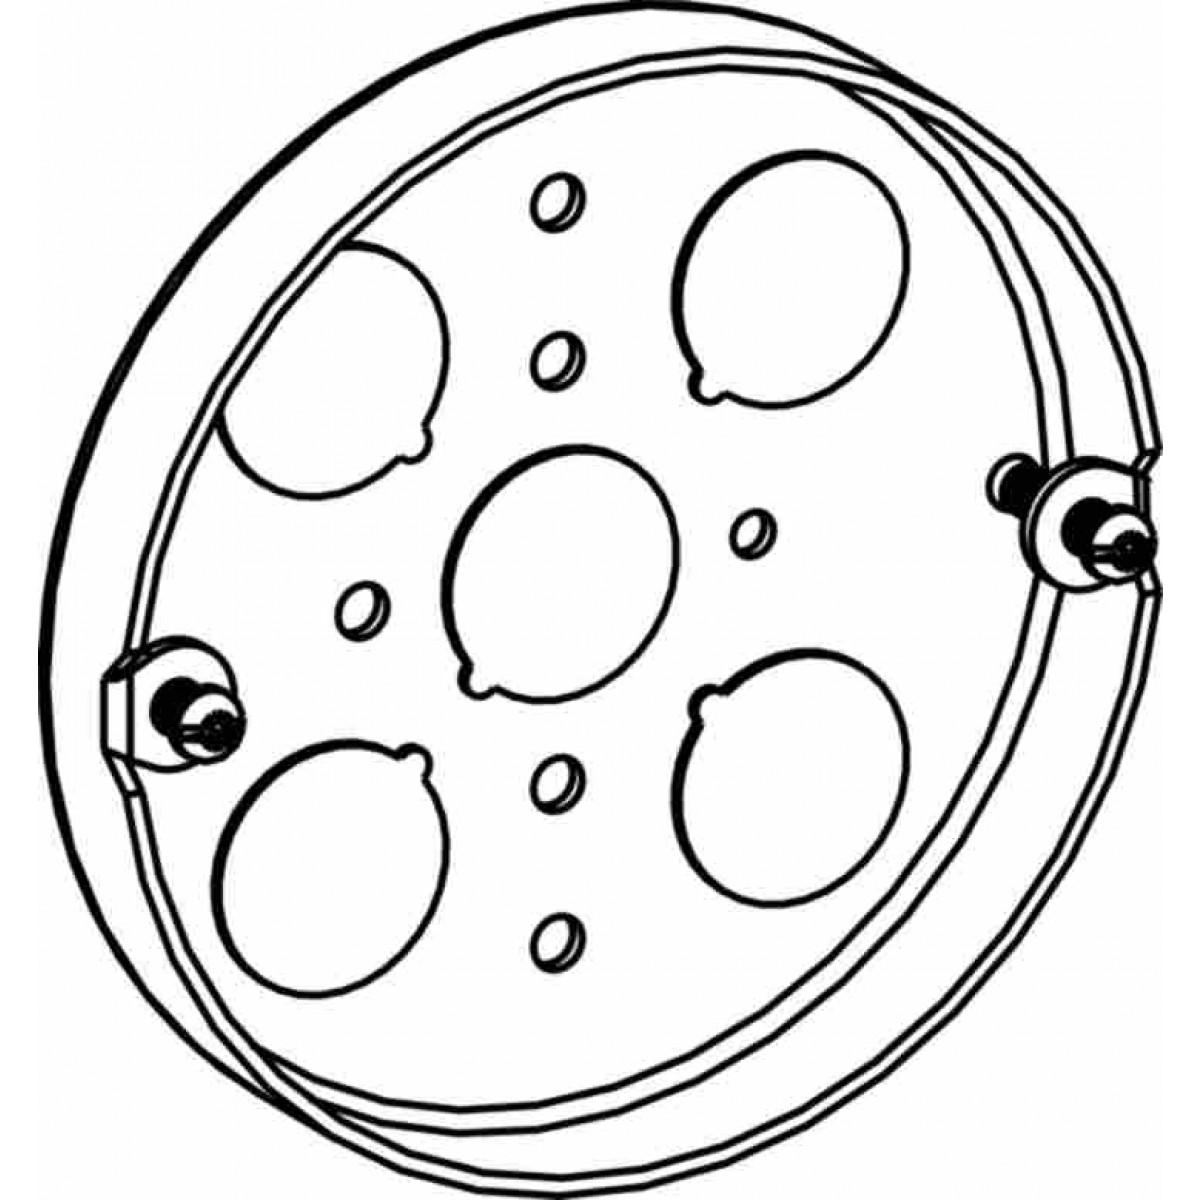 4pb - pancake boxes - electrical junction boxes